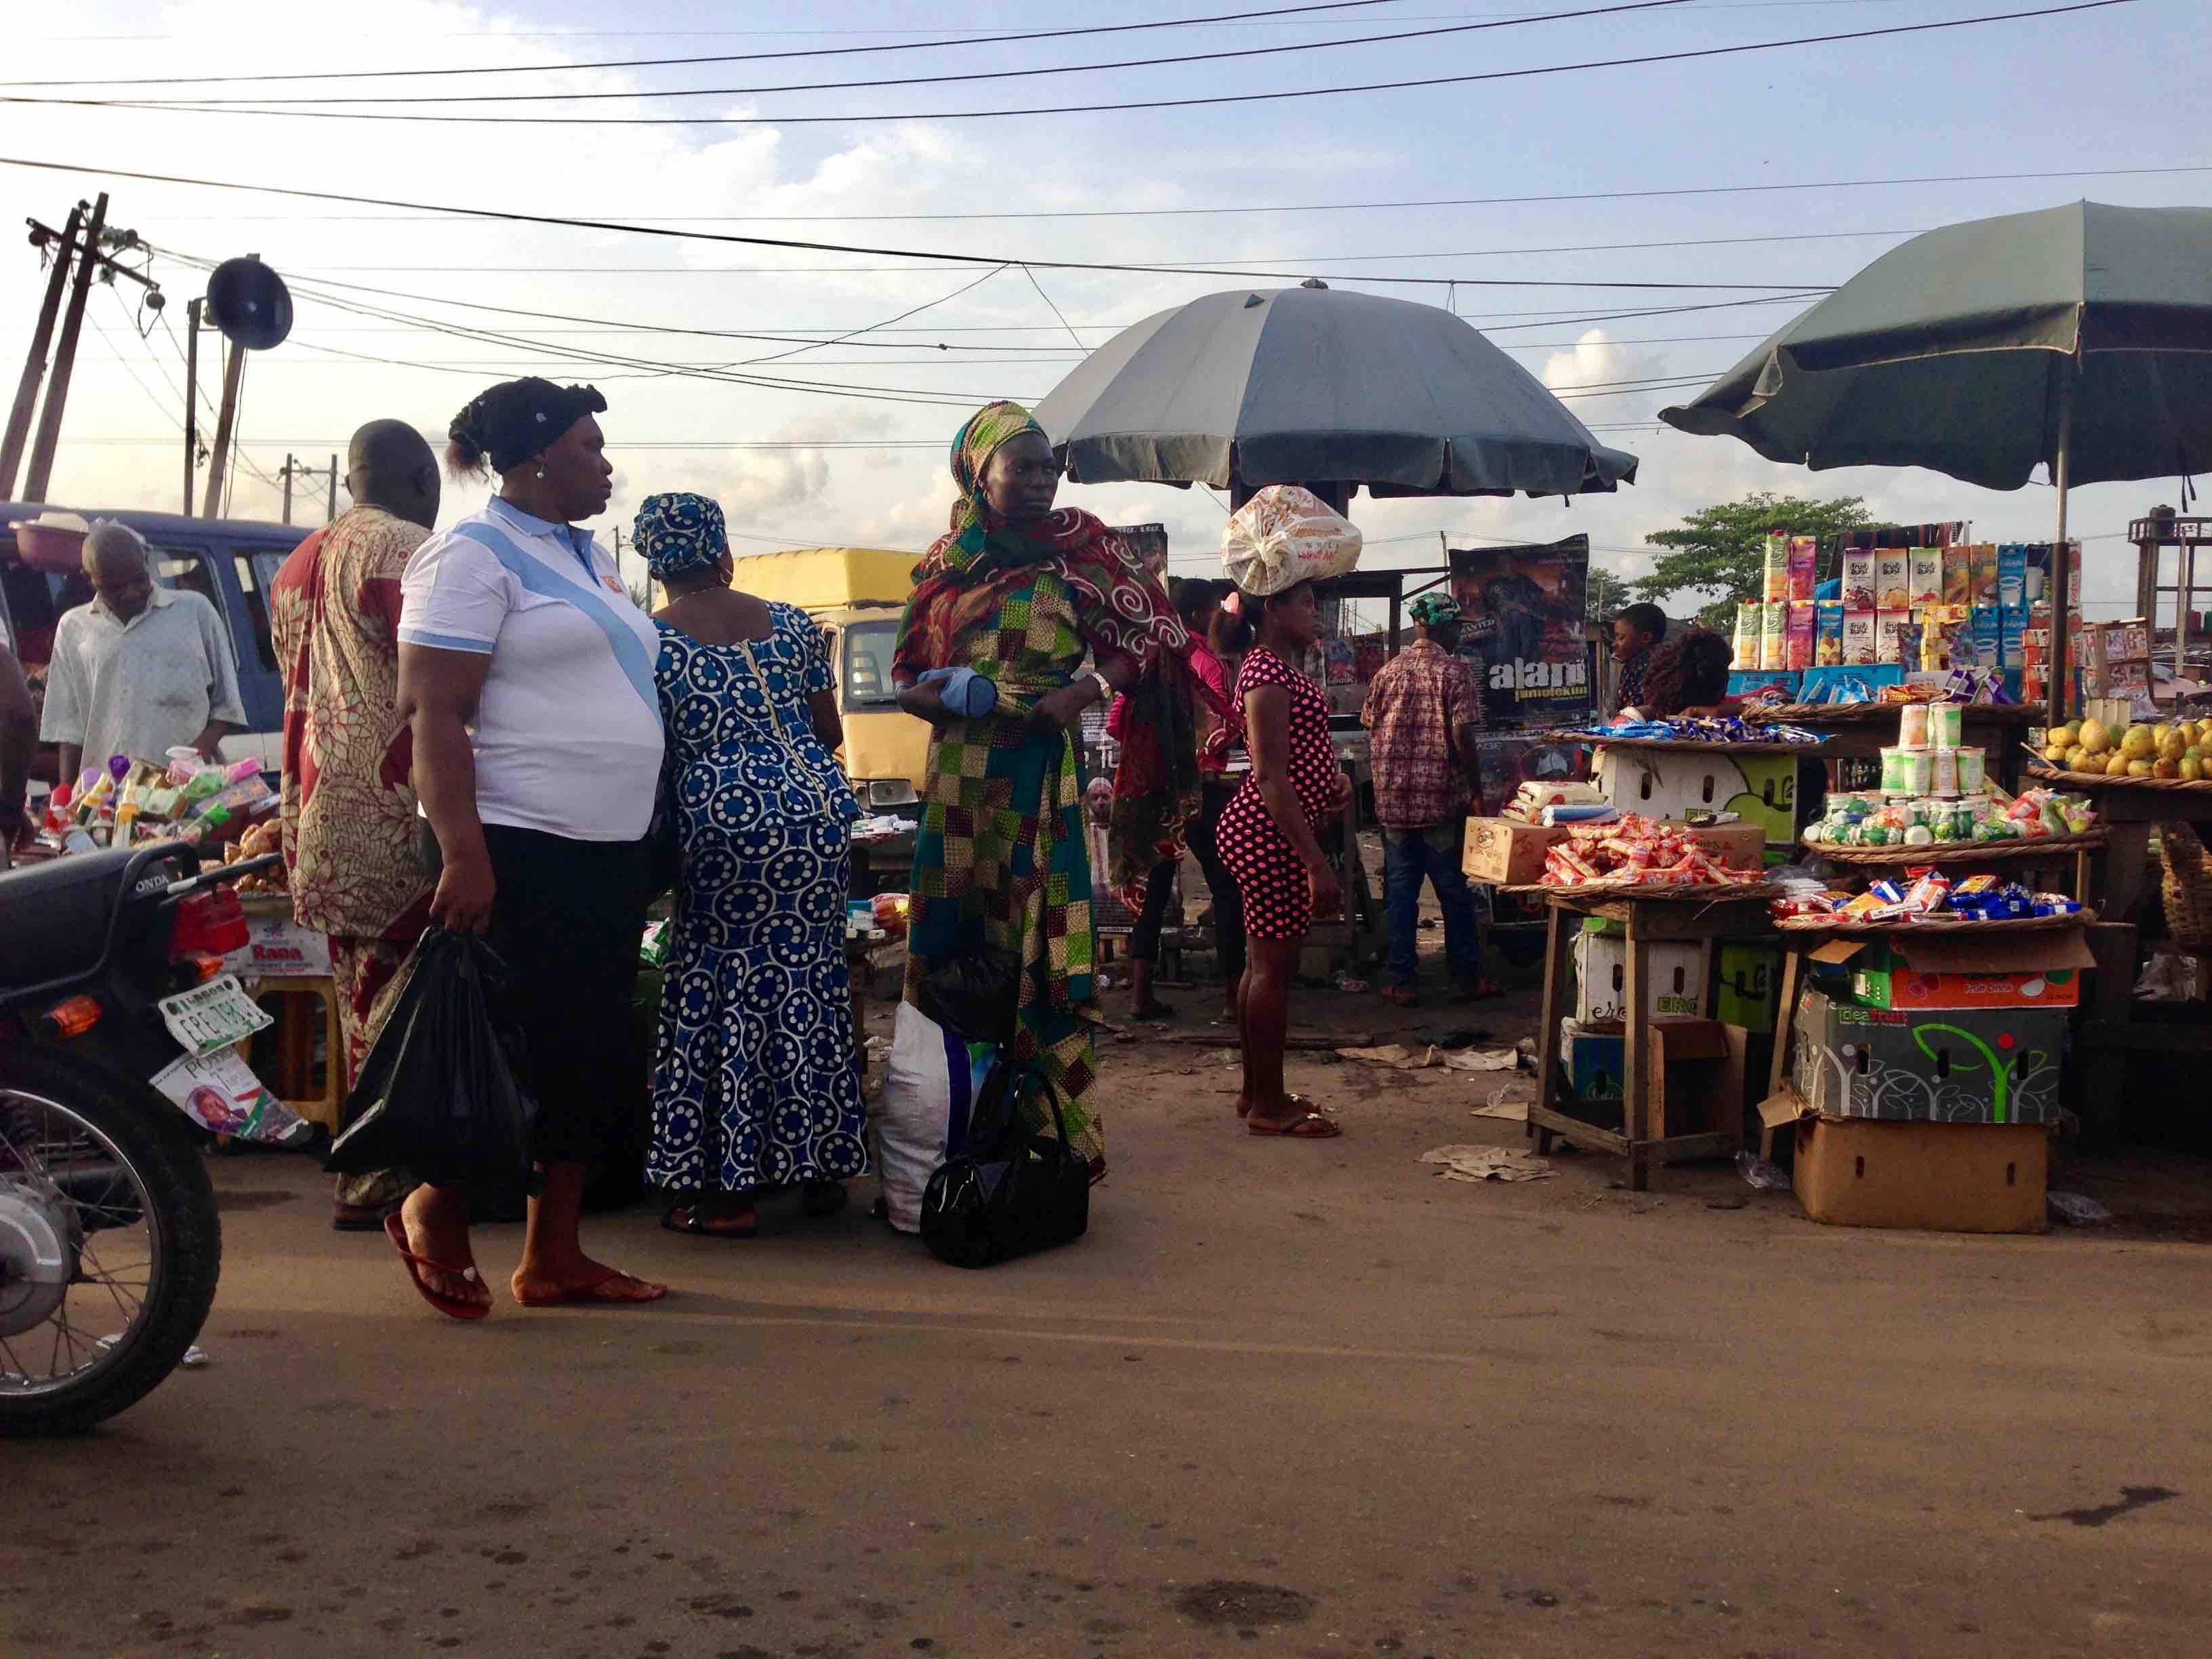 Street Market, Lagos - Badagry Expressway, Lagos State, Nigeria. #JujuFilms